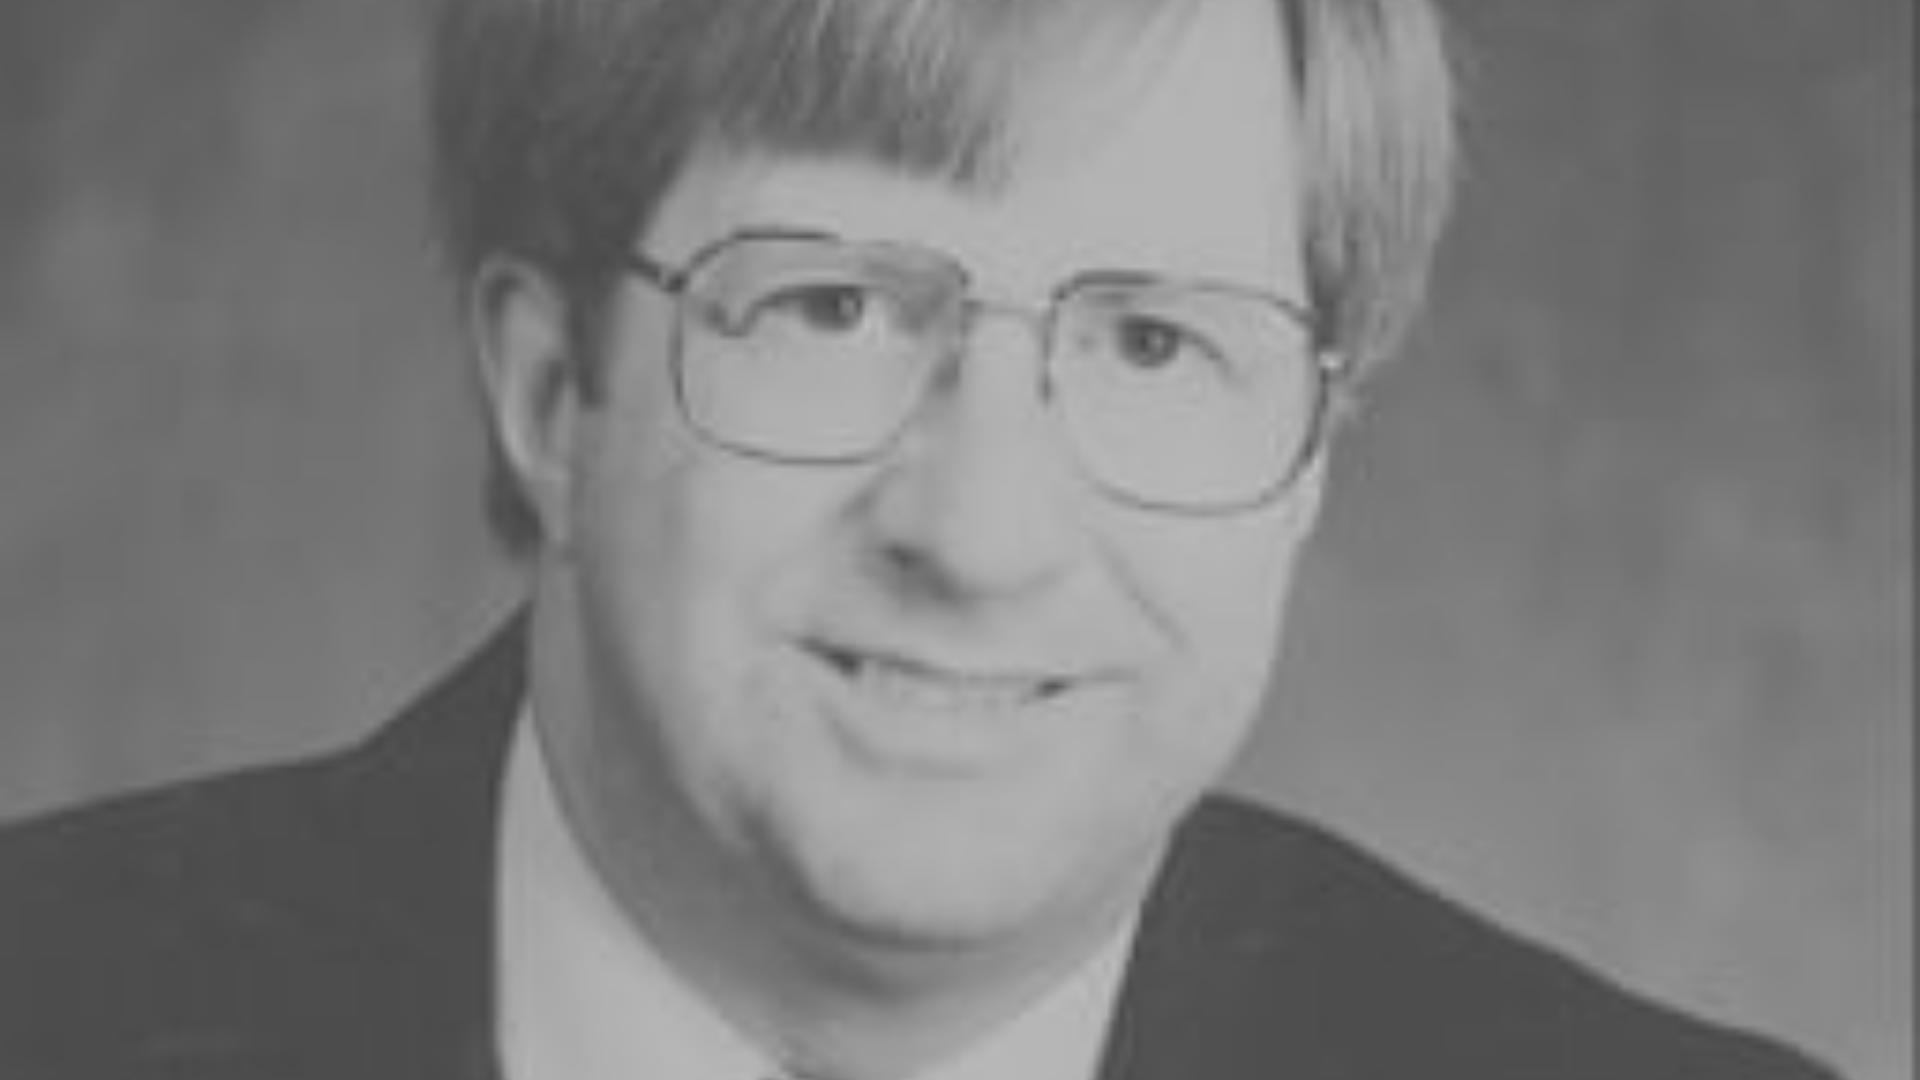 Larry Toole image 1979